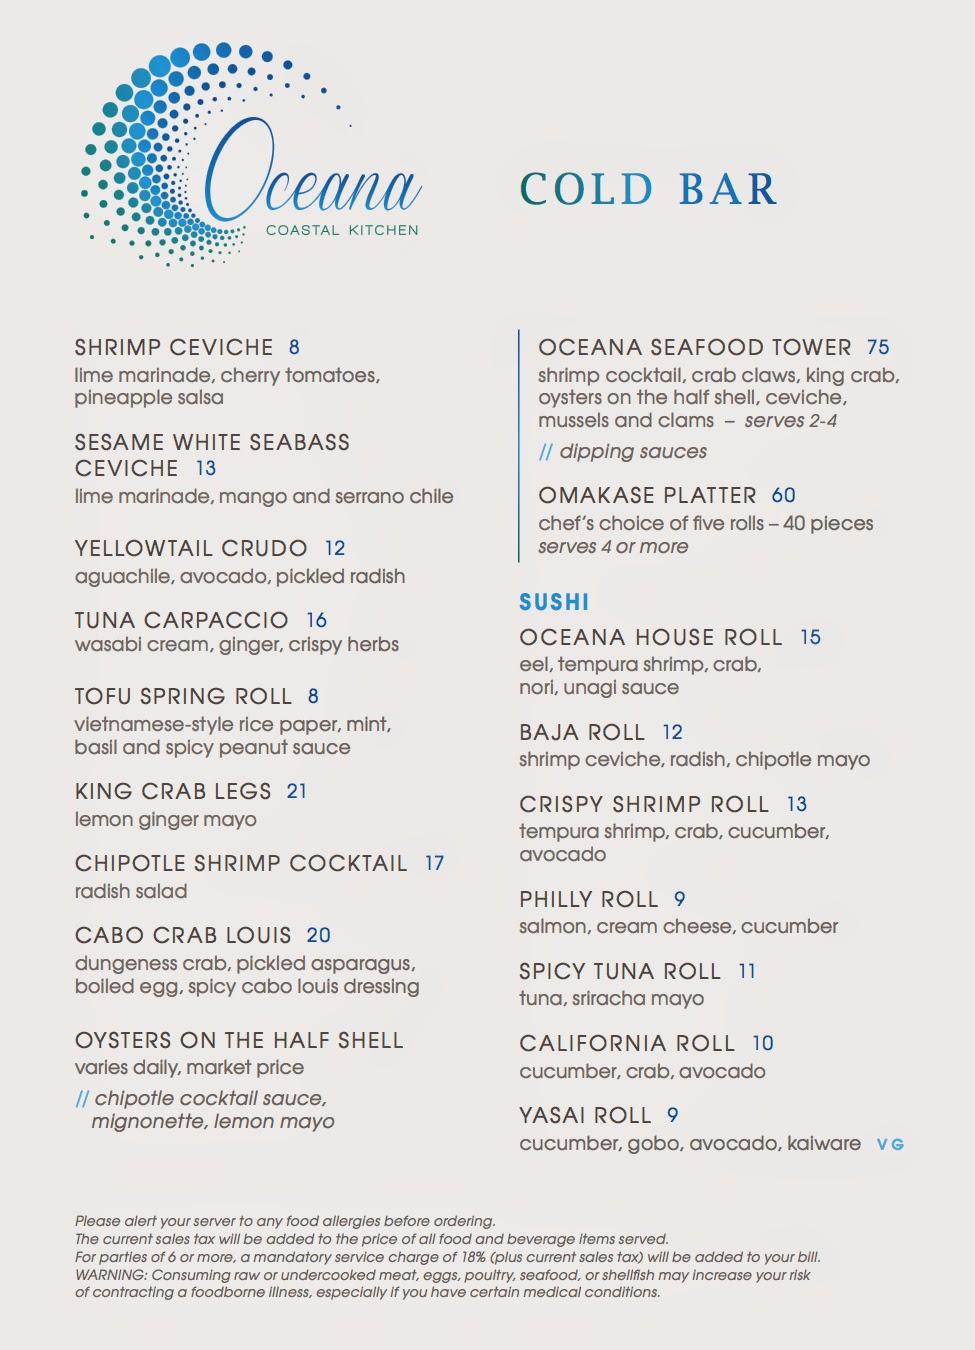 SanDiegoVille: Oceana Coastal Kitchen Now Offering Waterfront Dining ...